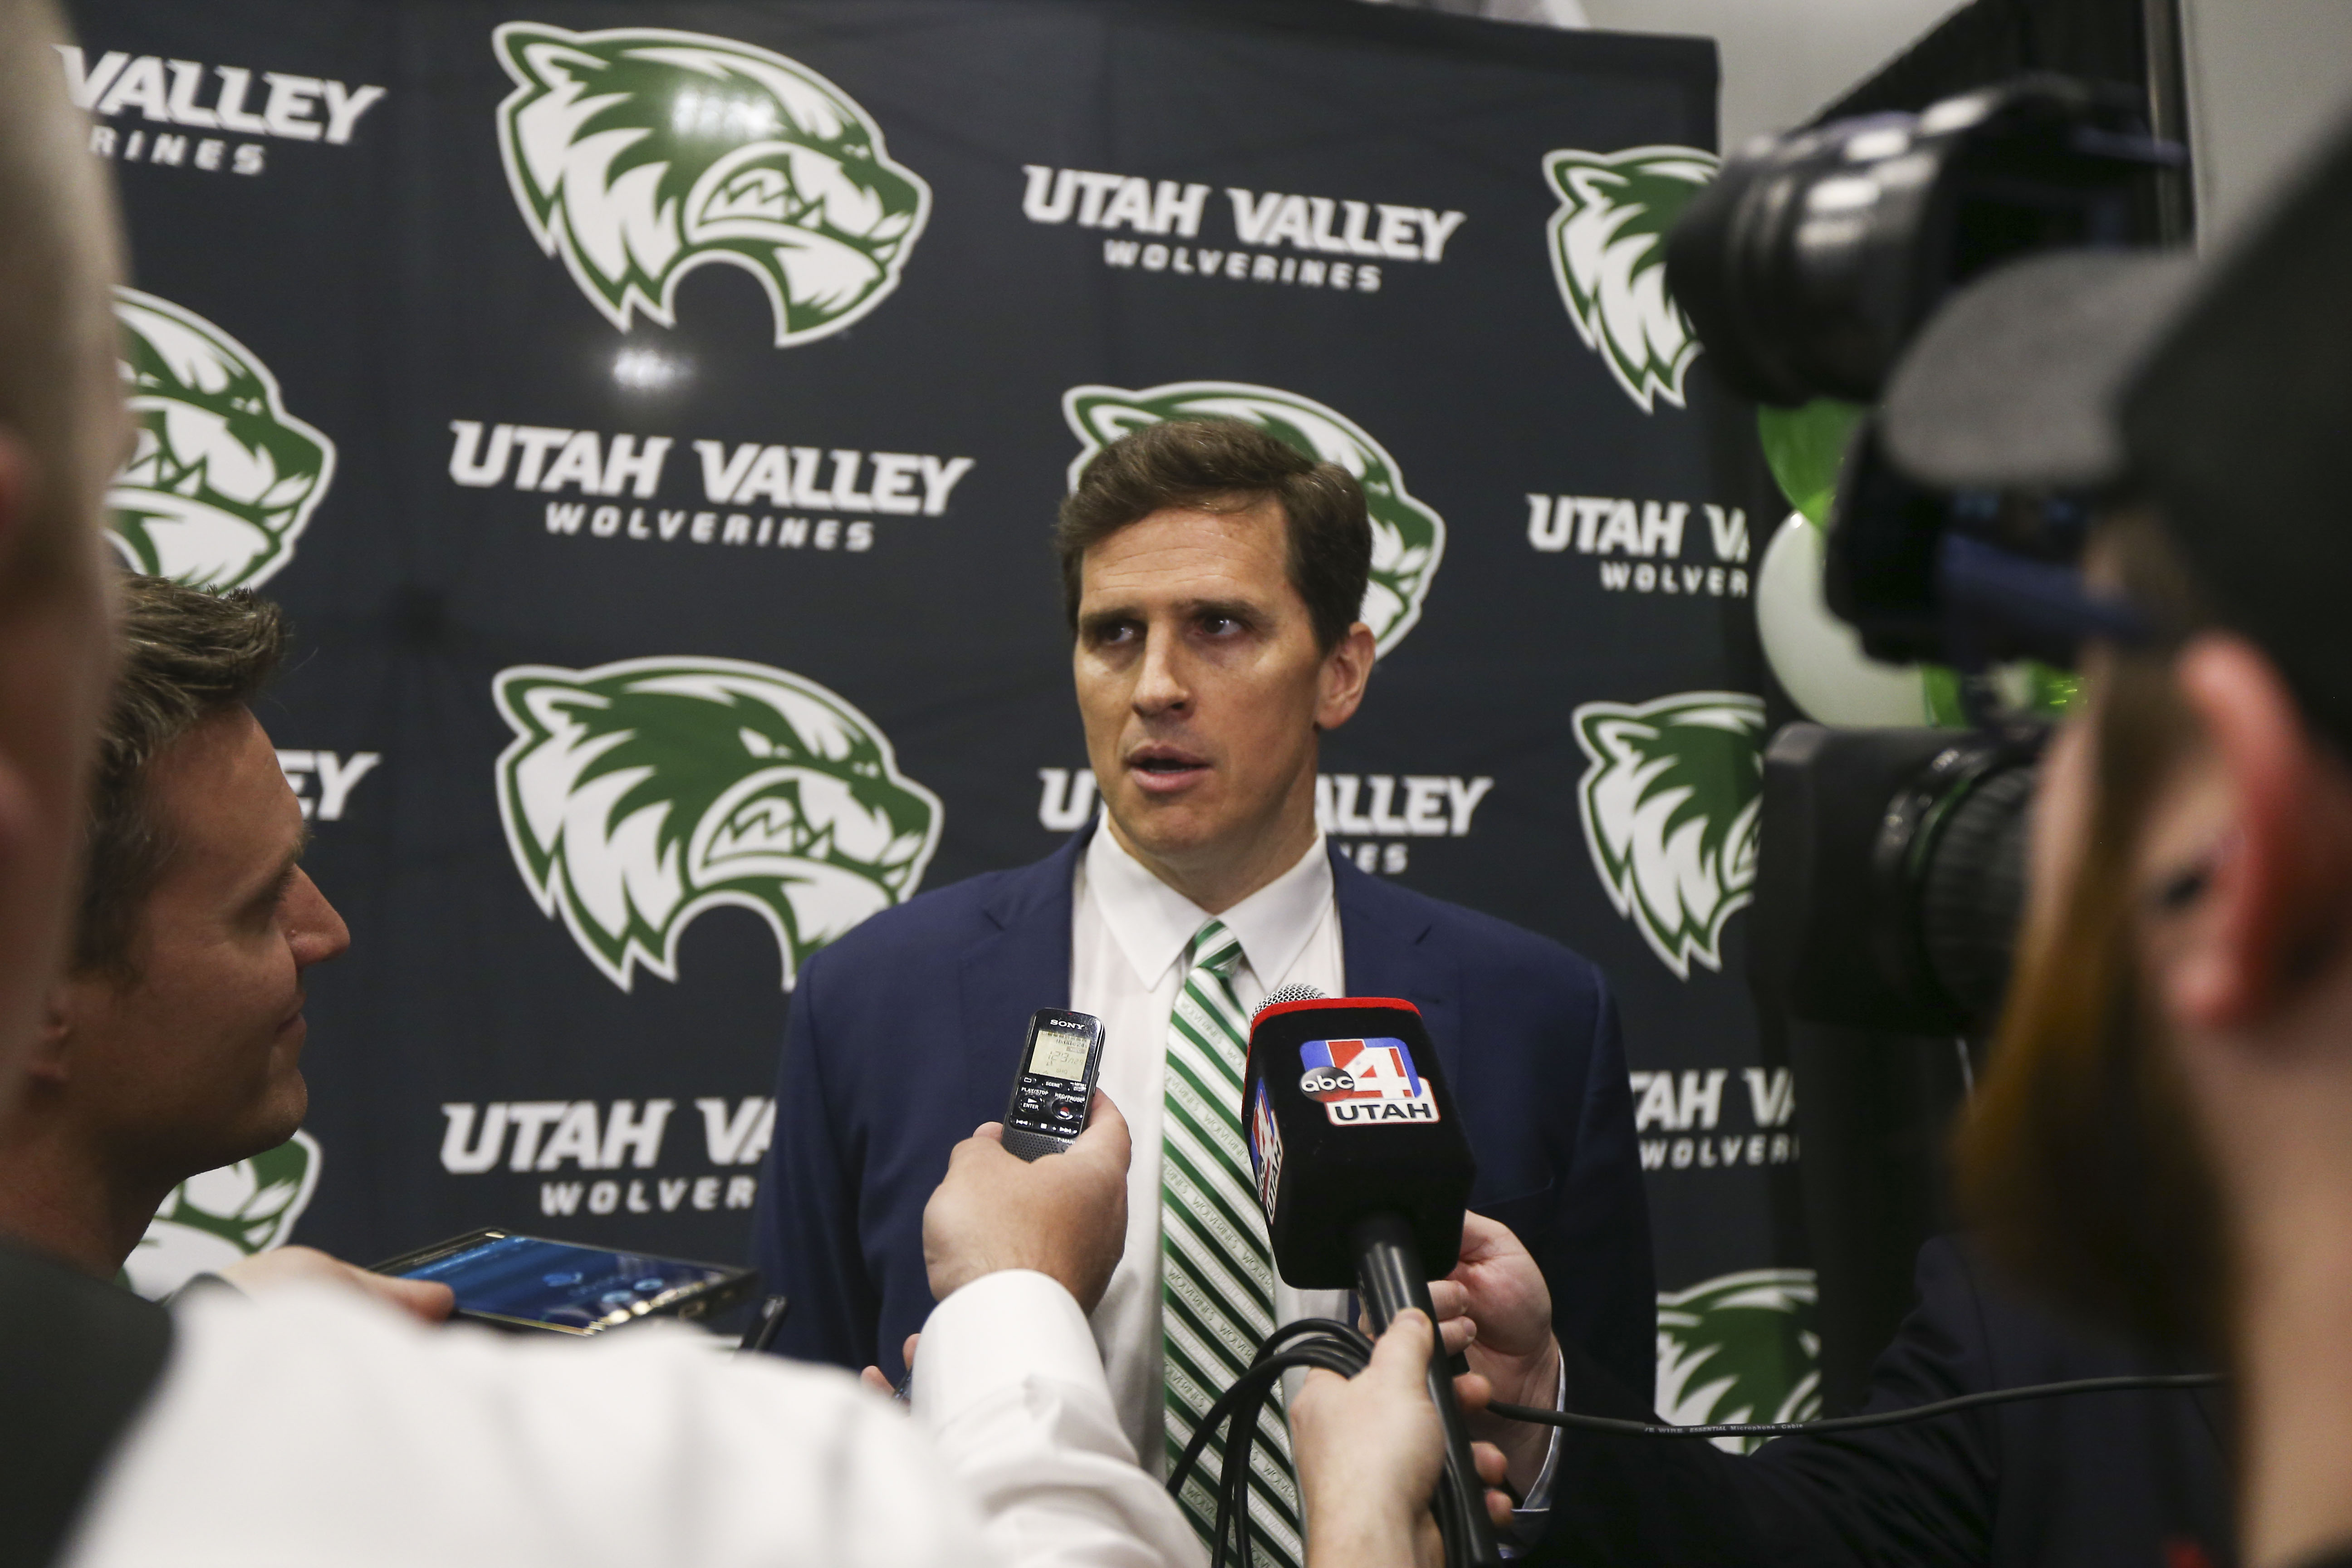 Mark Madsen speaks as Utah Valley's new men's basketball coach at the NUVI Basketball Center at Utah Valley University in Orem on Monday, April 15, 2019.